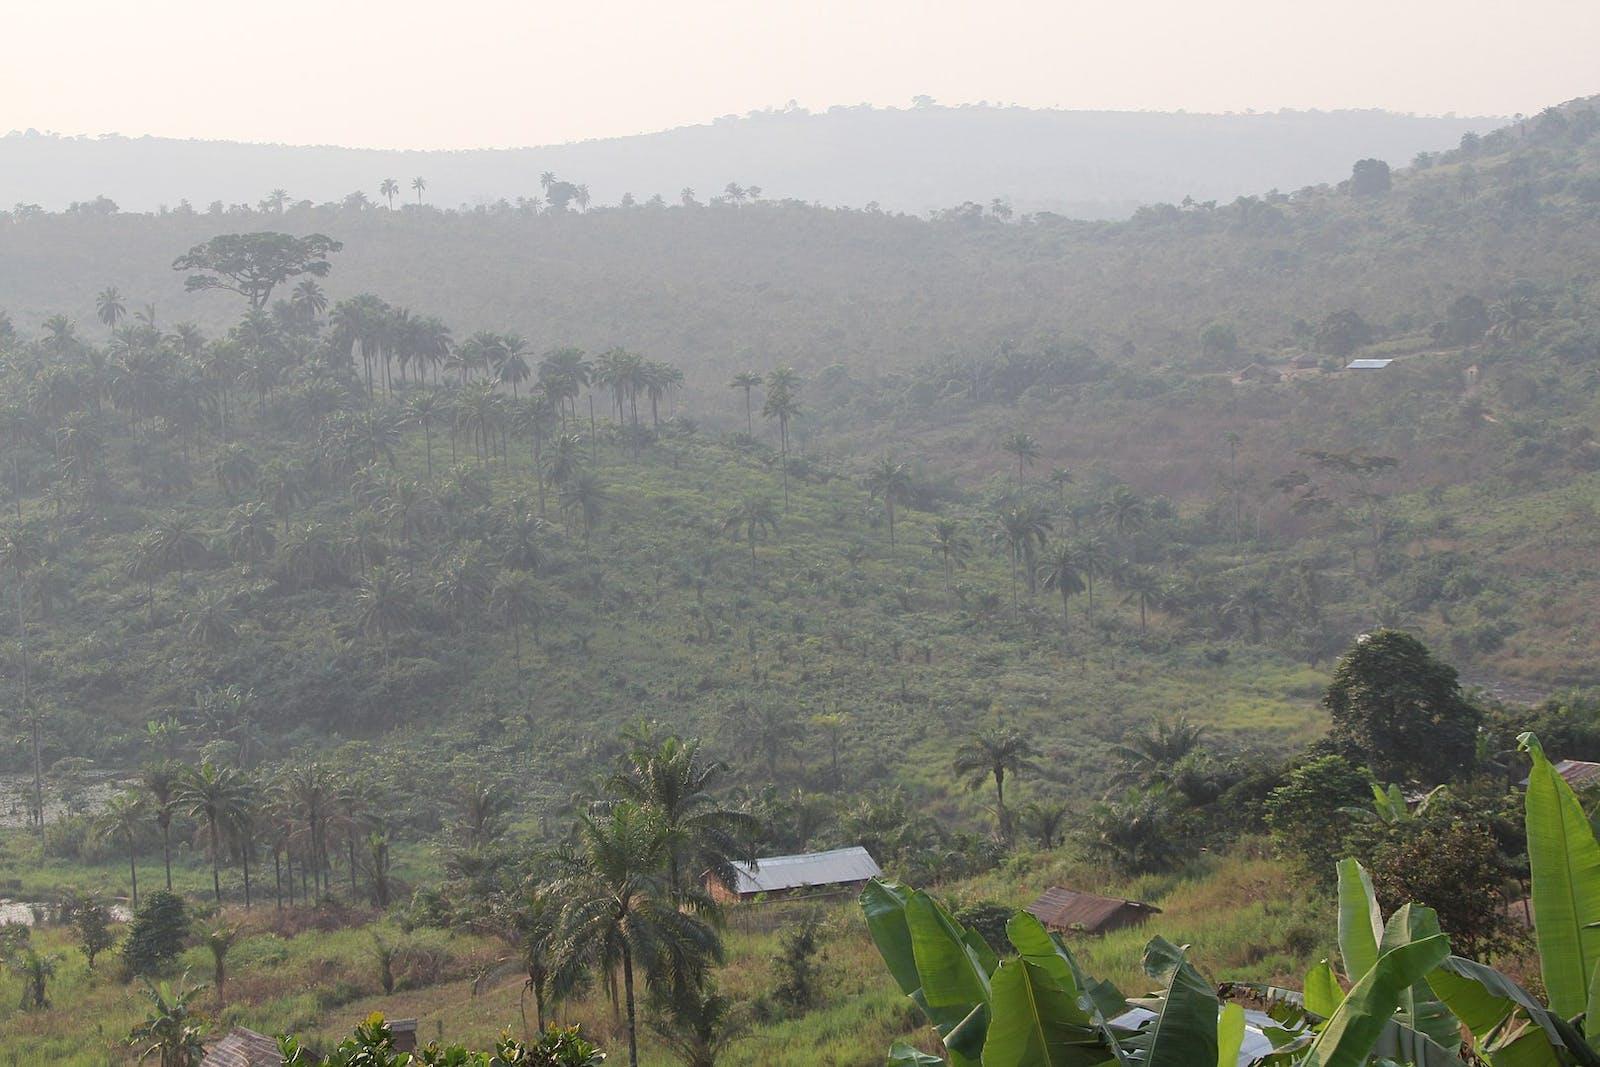 Southern Congolian Forest-Savanna